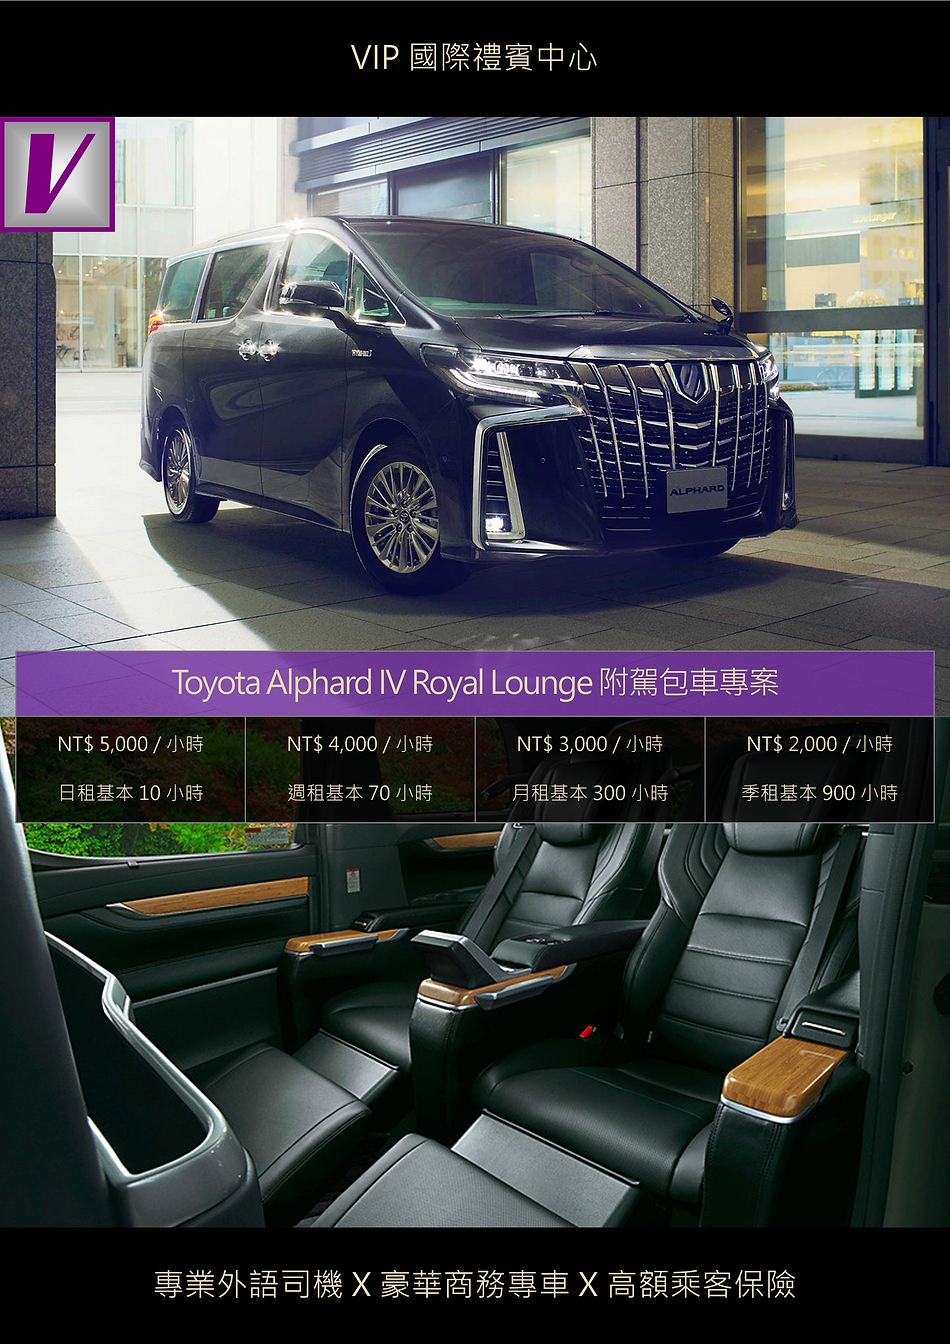 VIP國際禮賓中心 TOYOTA ALPHARD IV ROYAL LOUNGE 附駕包車專案 DM.png